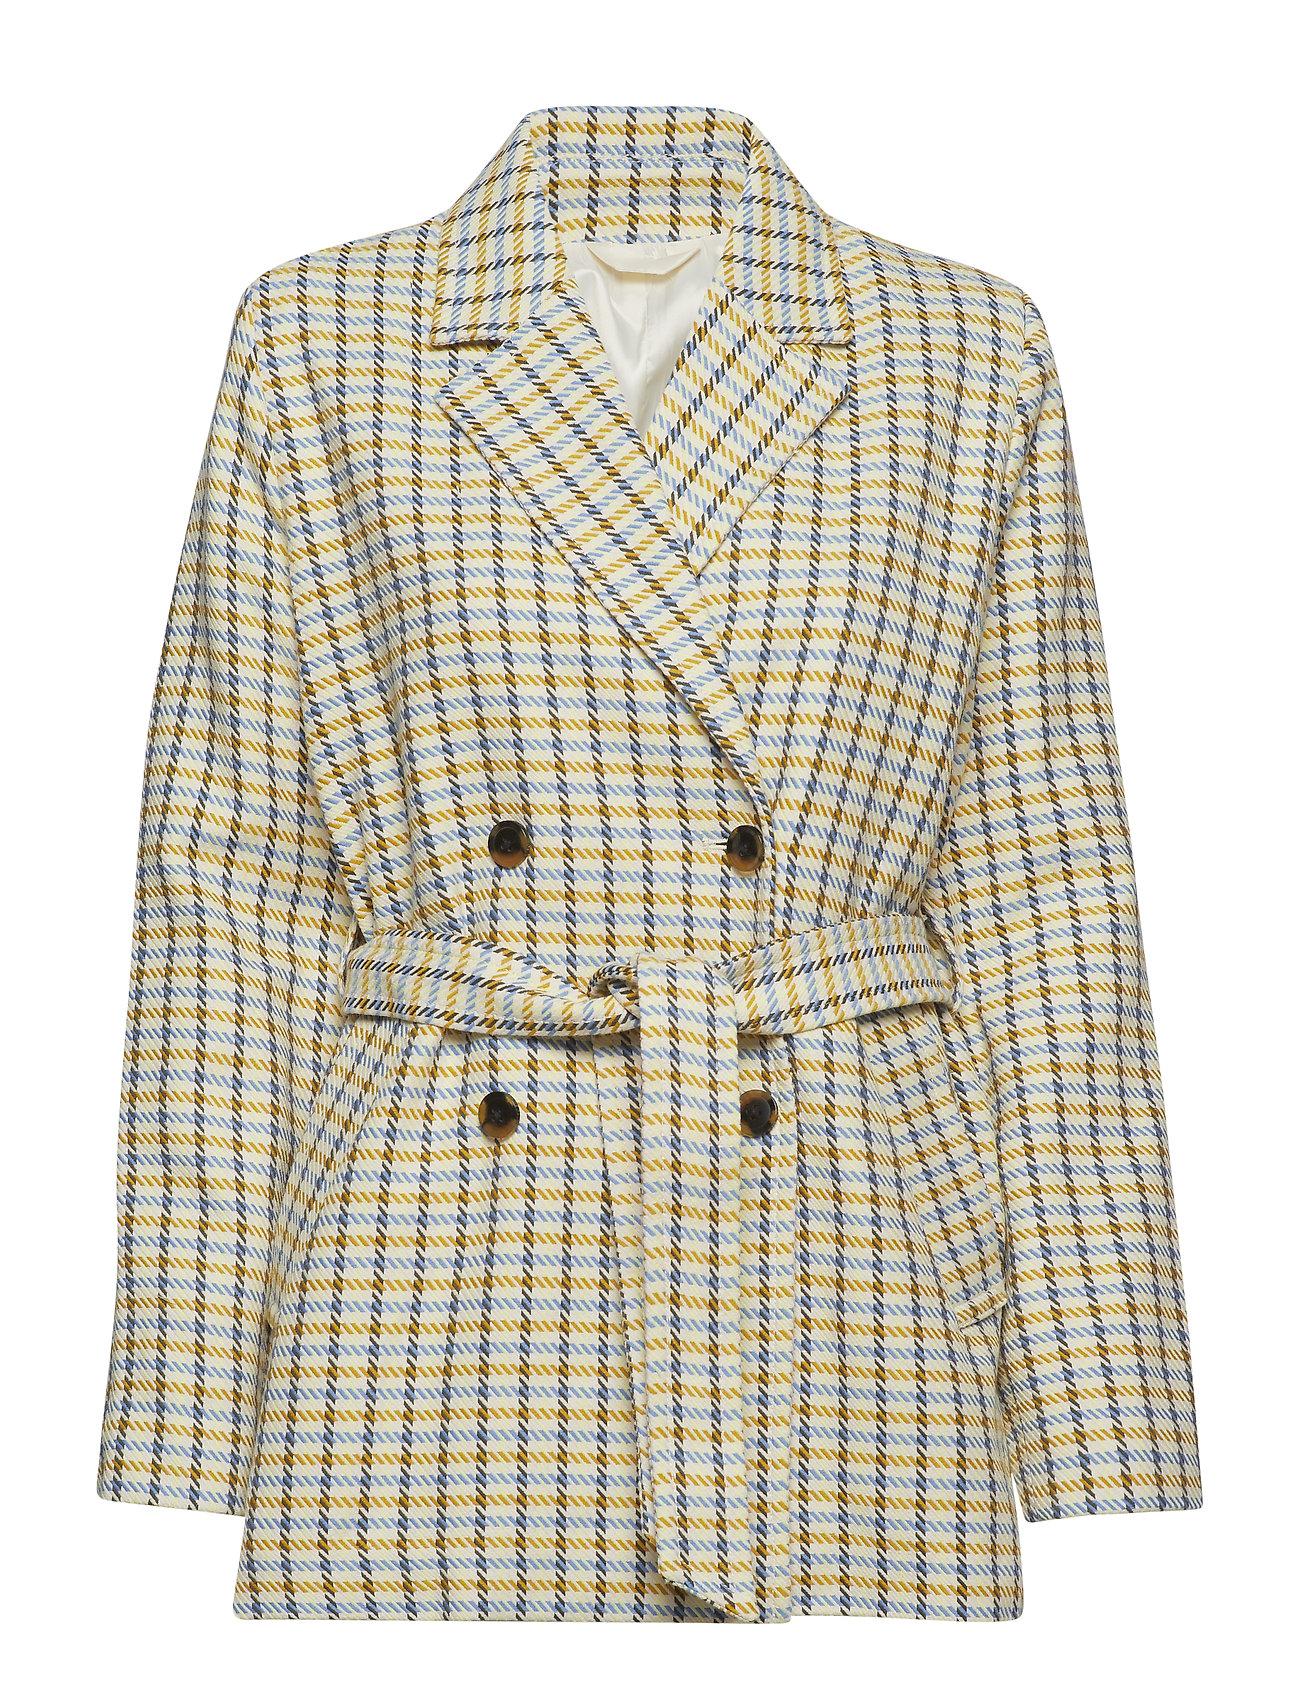 Samsøe & Samsøe Minty jacket 10886 - OLIVE CH.